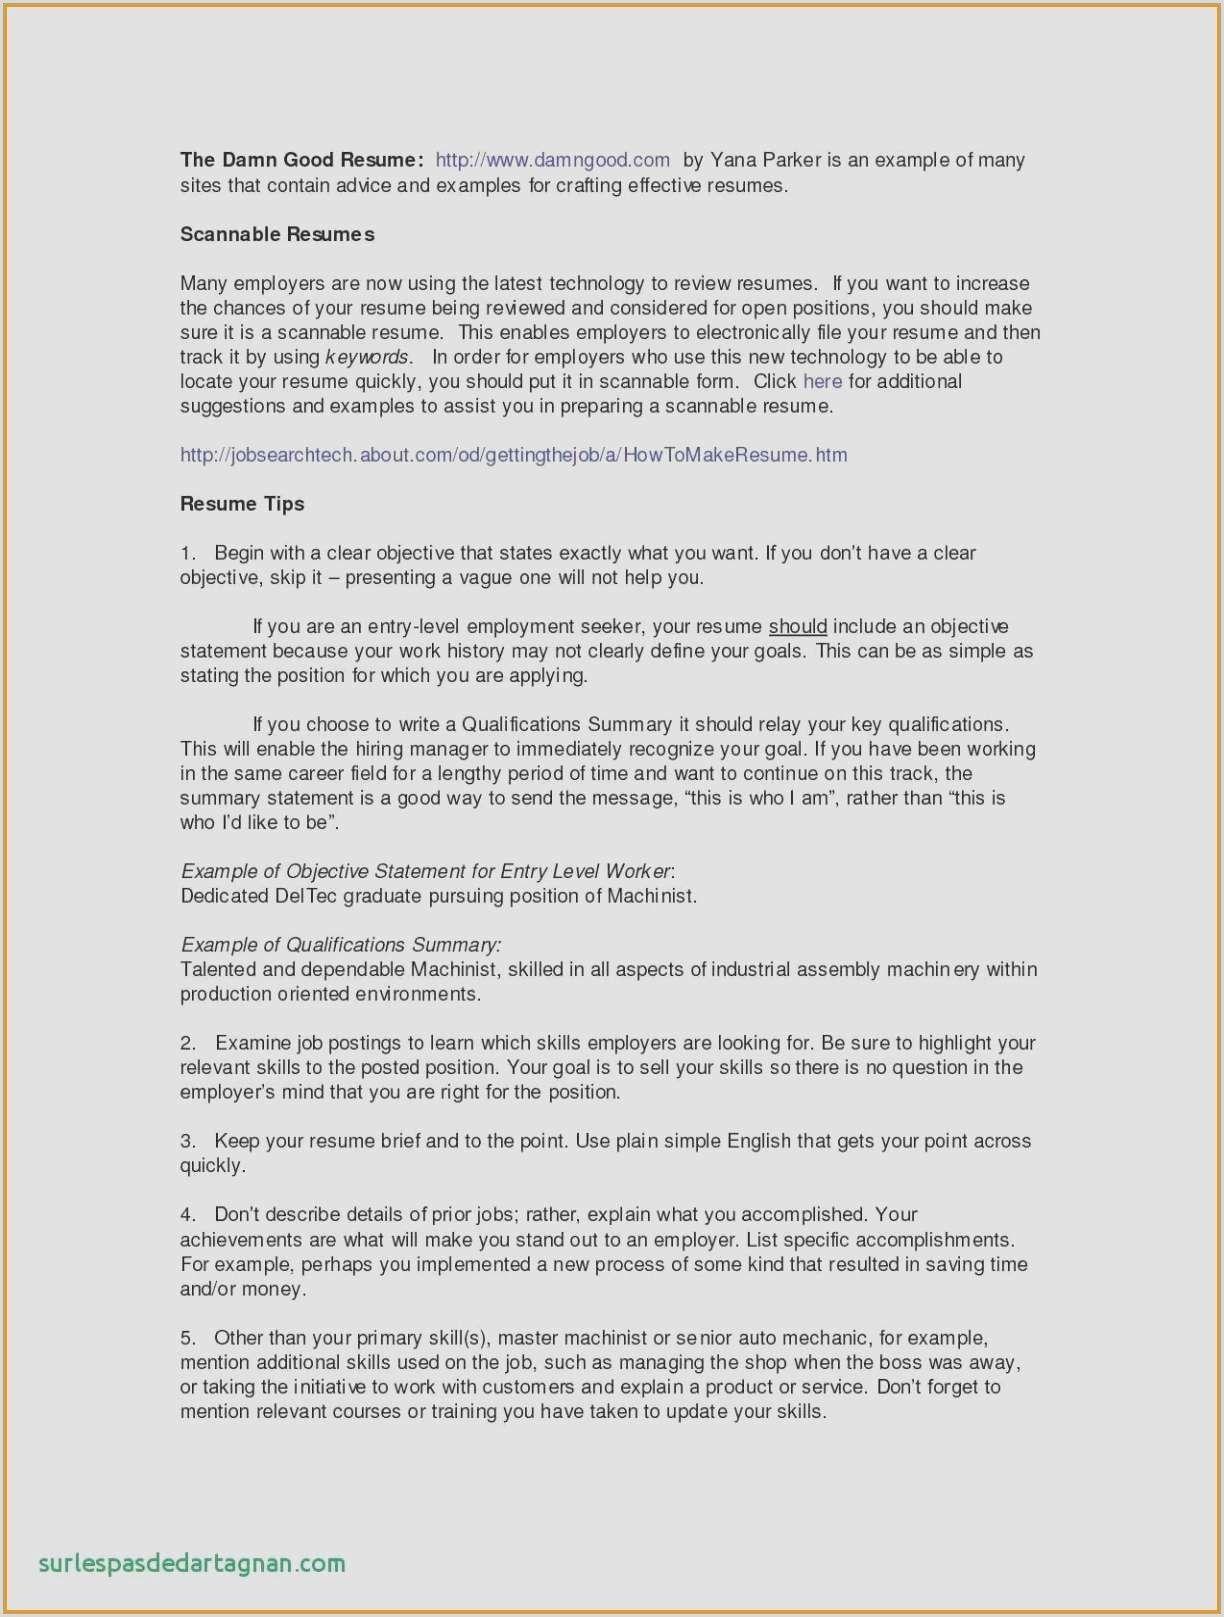 Freight Forwarder Resume Sample Sales Resume Examples Resume Skills Career Change Resume